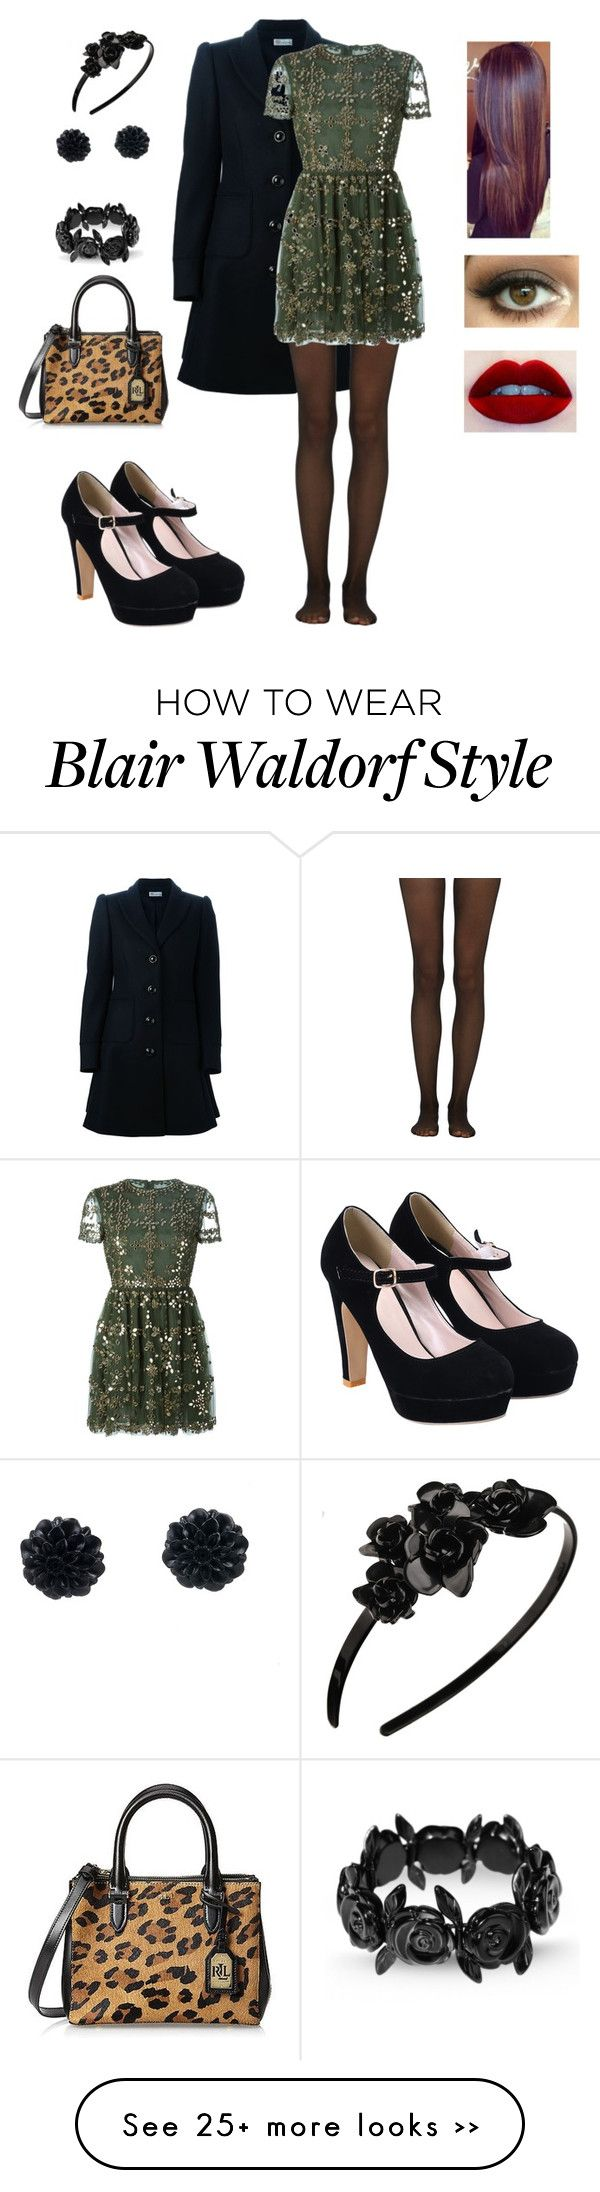 """Blair Waldorf | Gossip Girl | NYC | Winter"" by juliakp1234 on Polyvore"